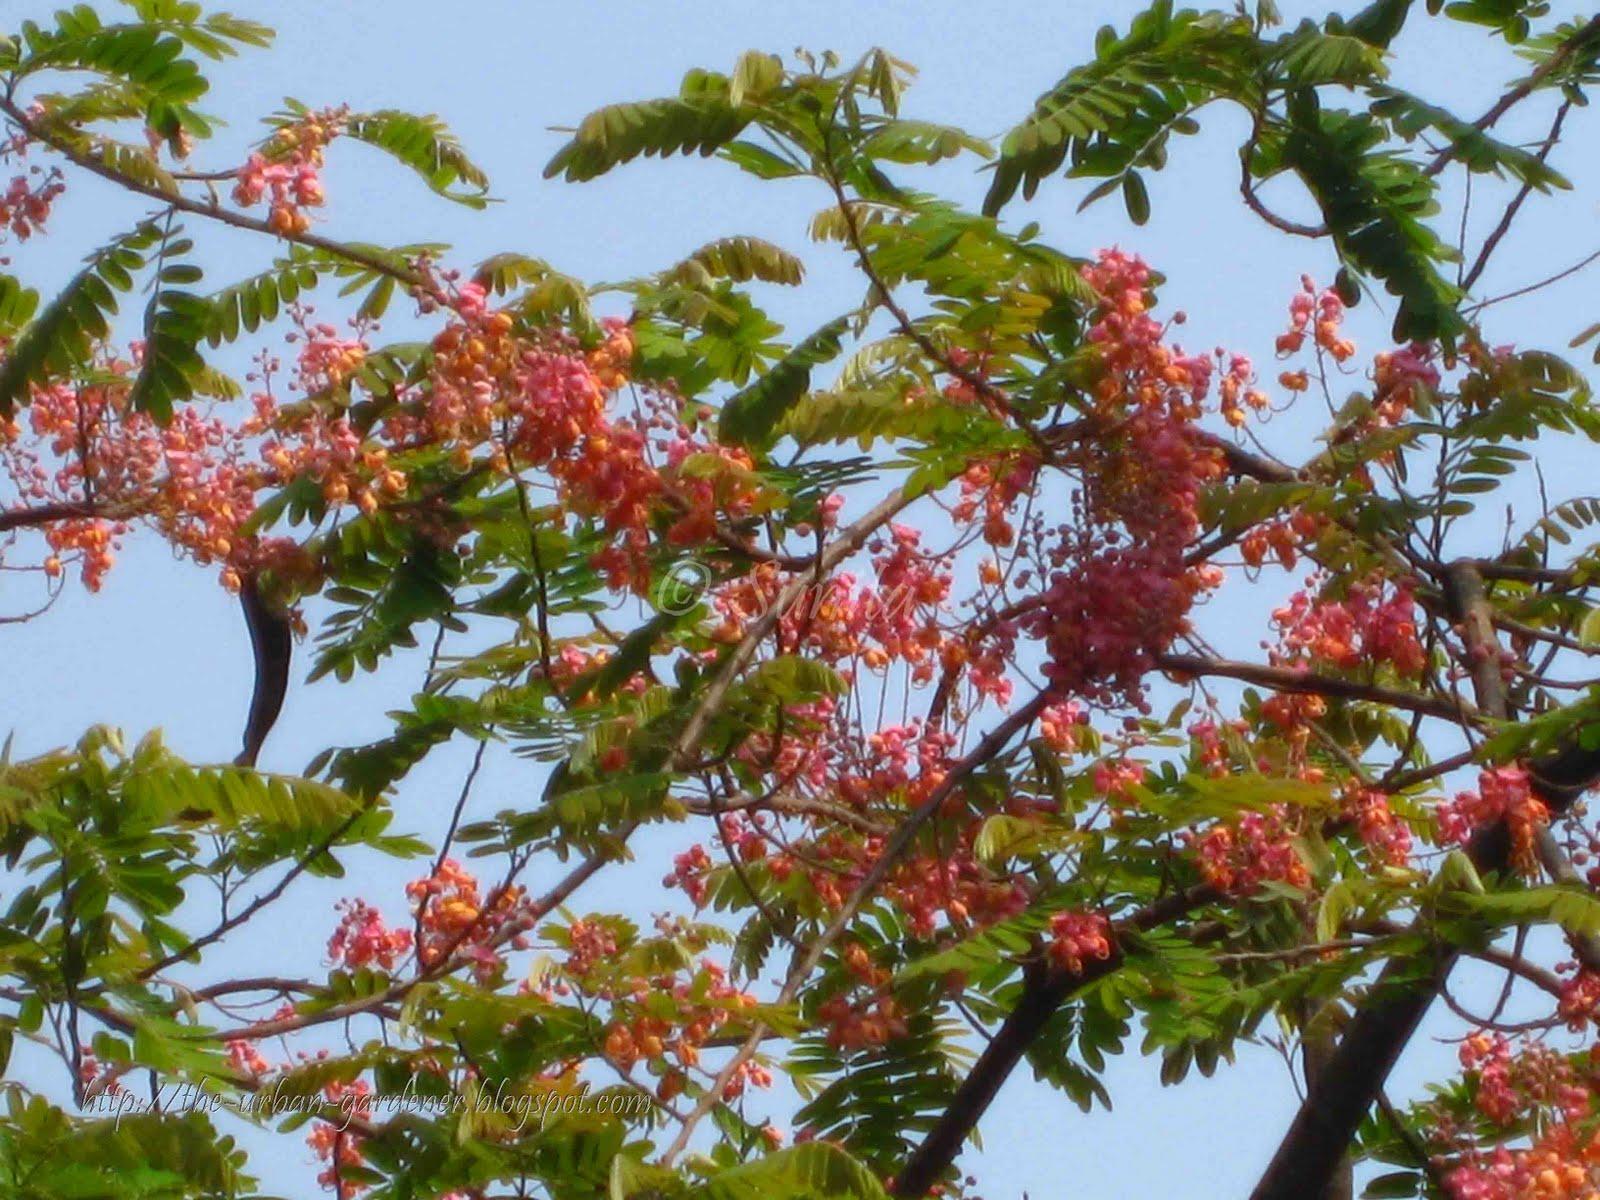 Summer Flower: Summer Flowering Trees